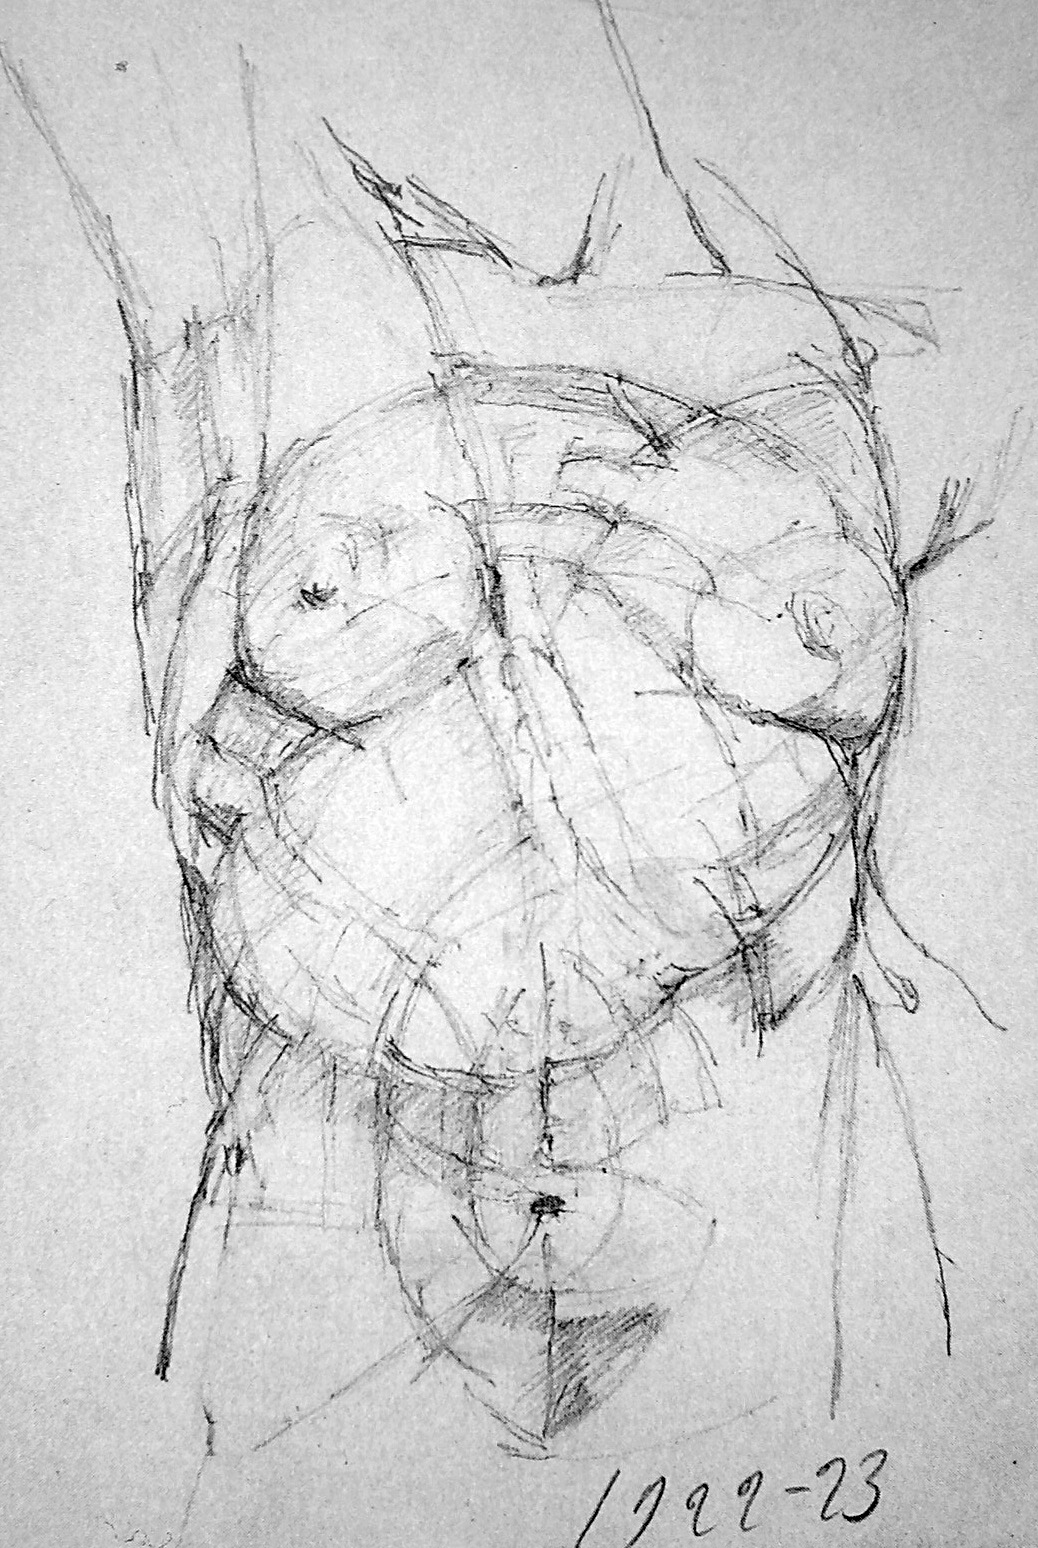 Alberto giacometti gesture drawings